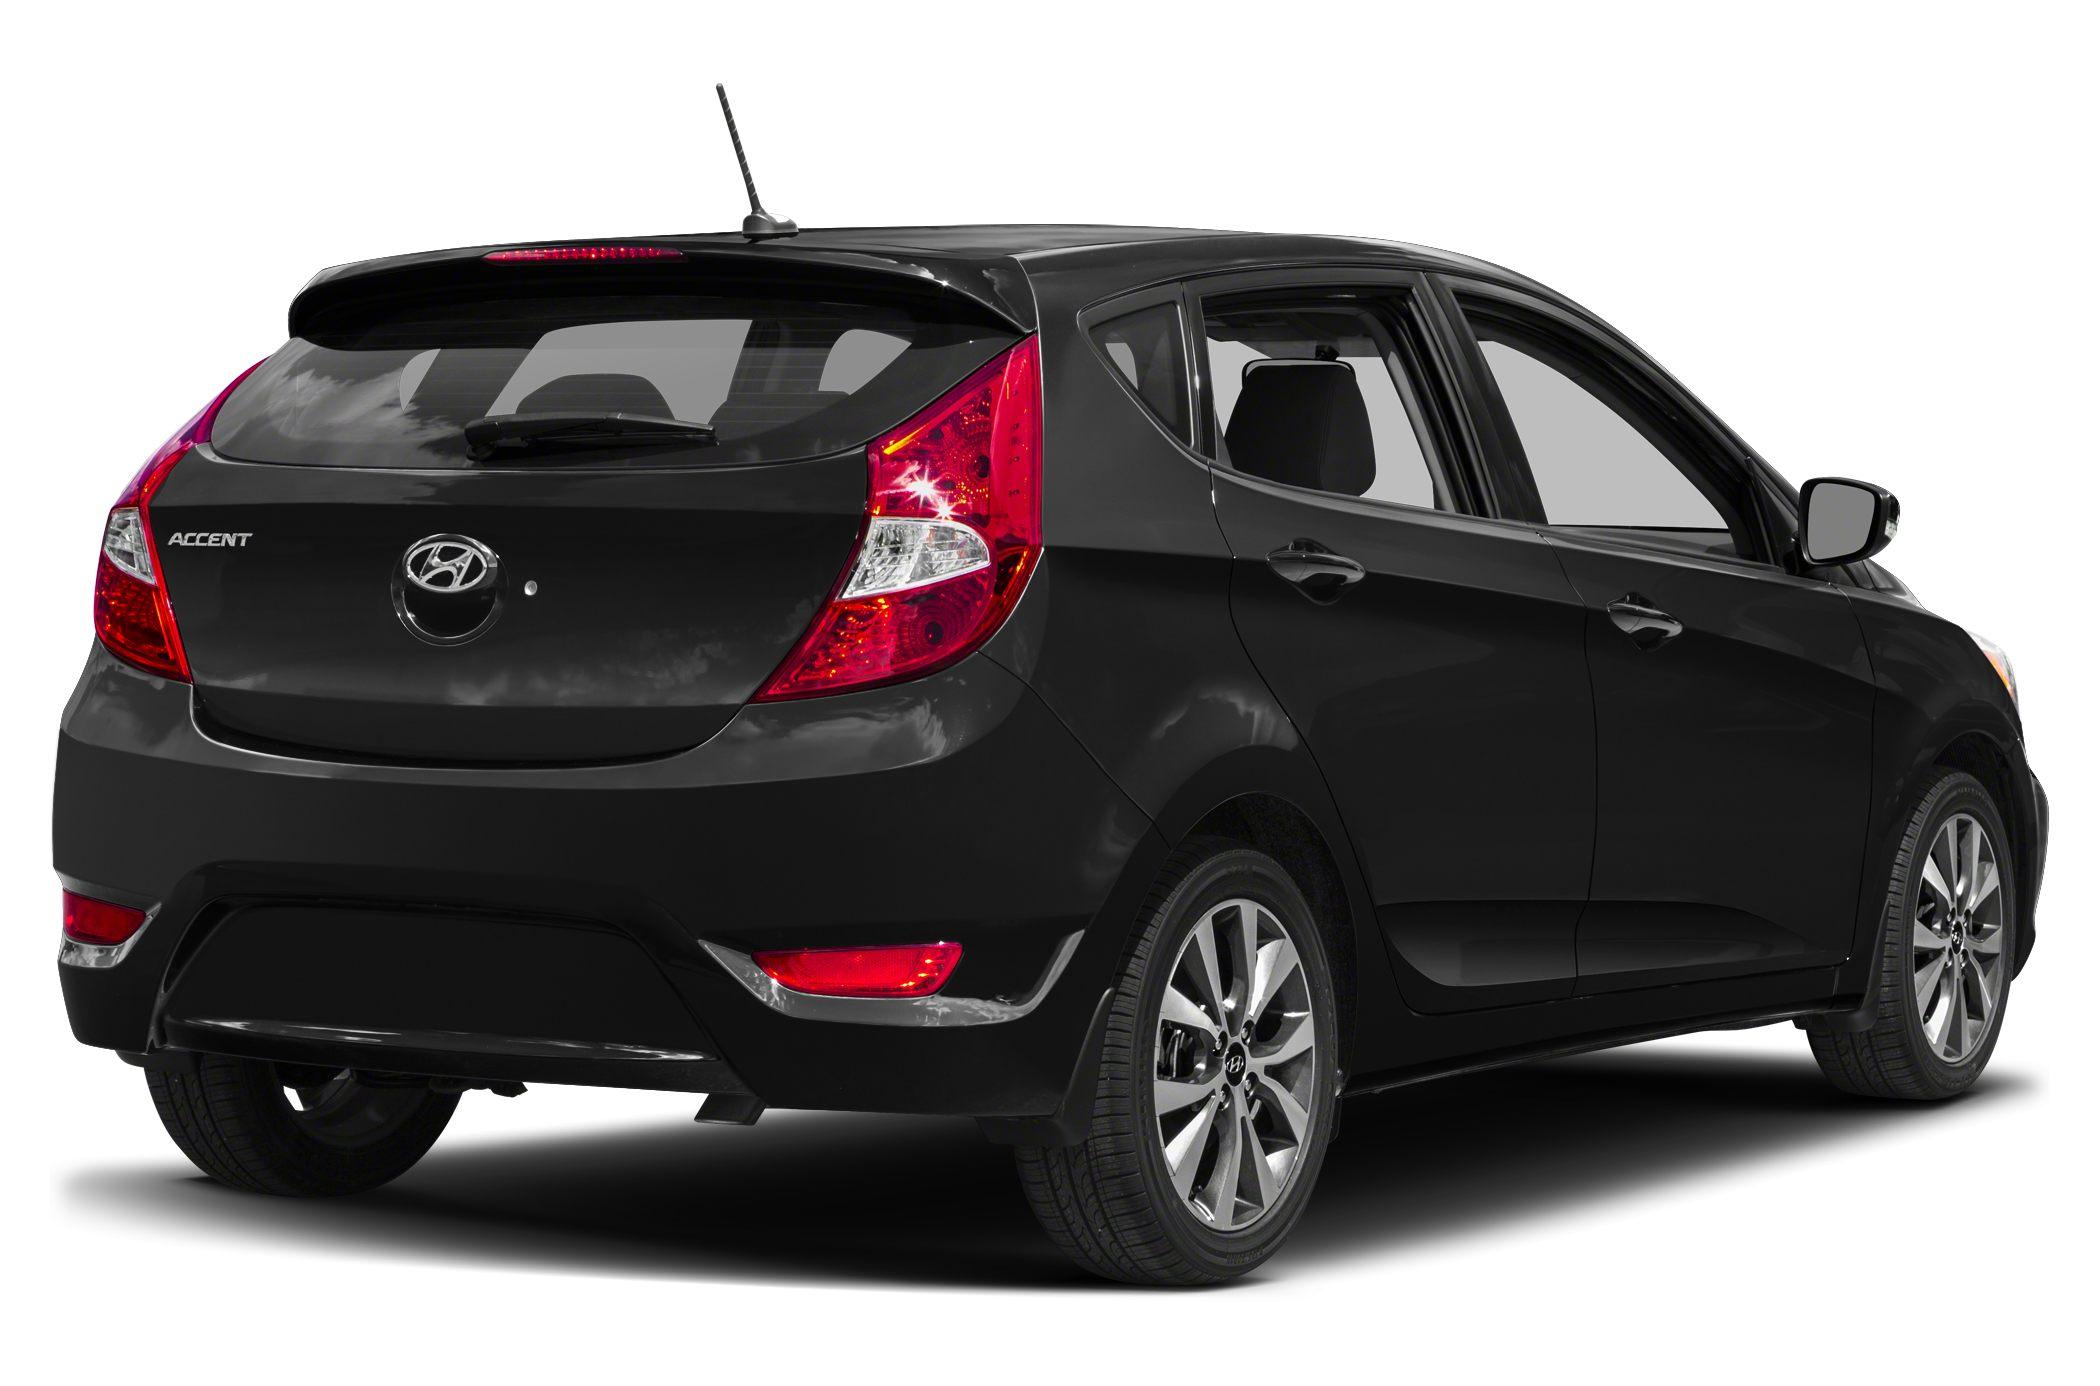 Hyundai Accent Reviews Specs And Prices Cars Com